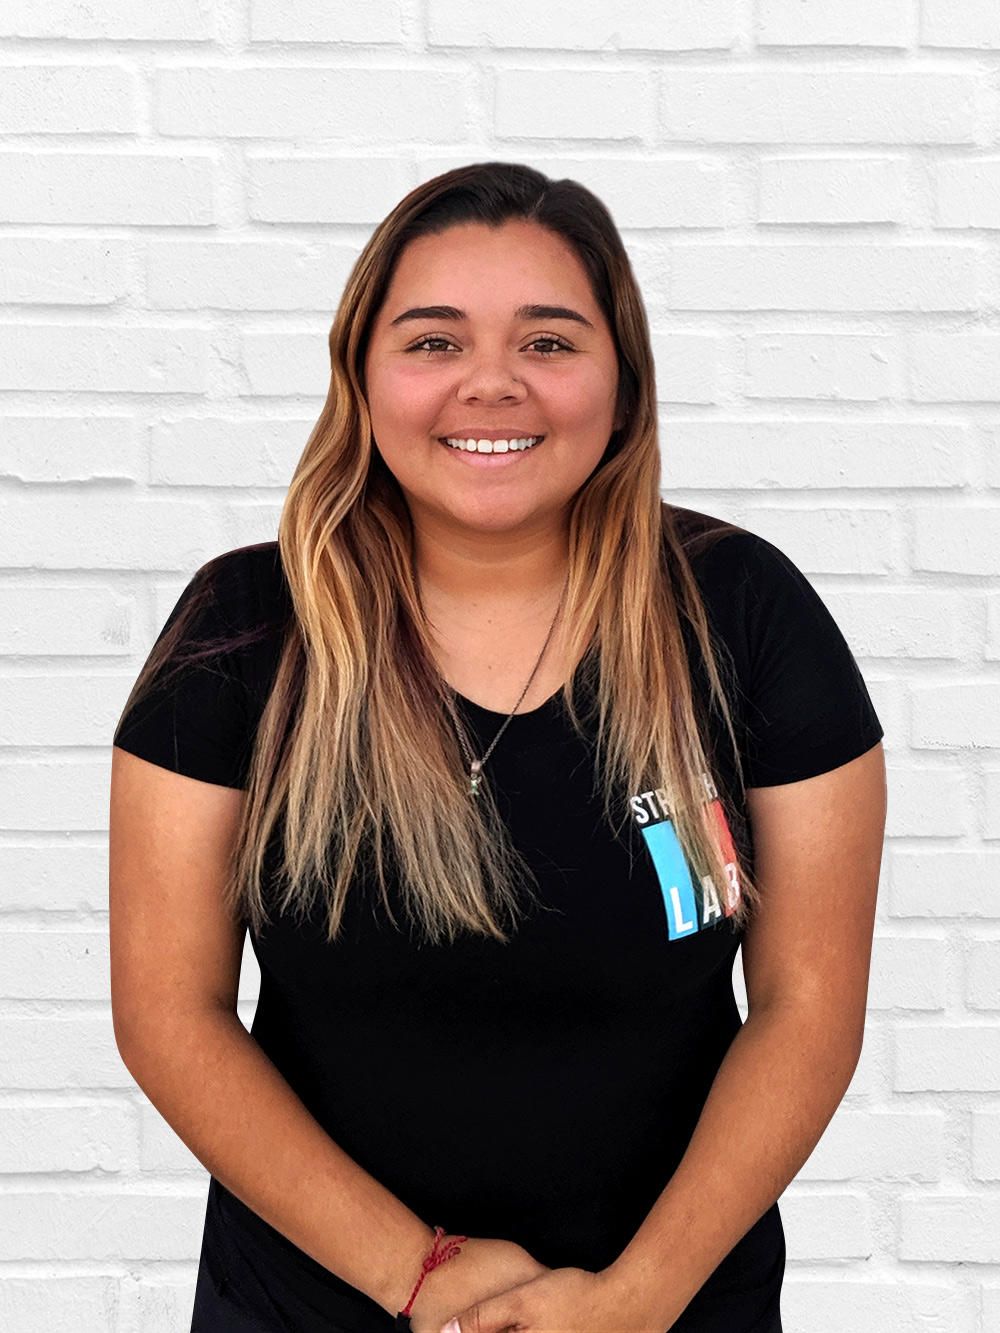 Anissa Carrillo